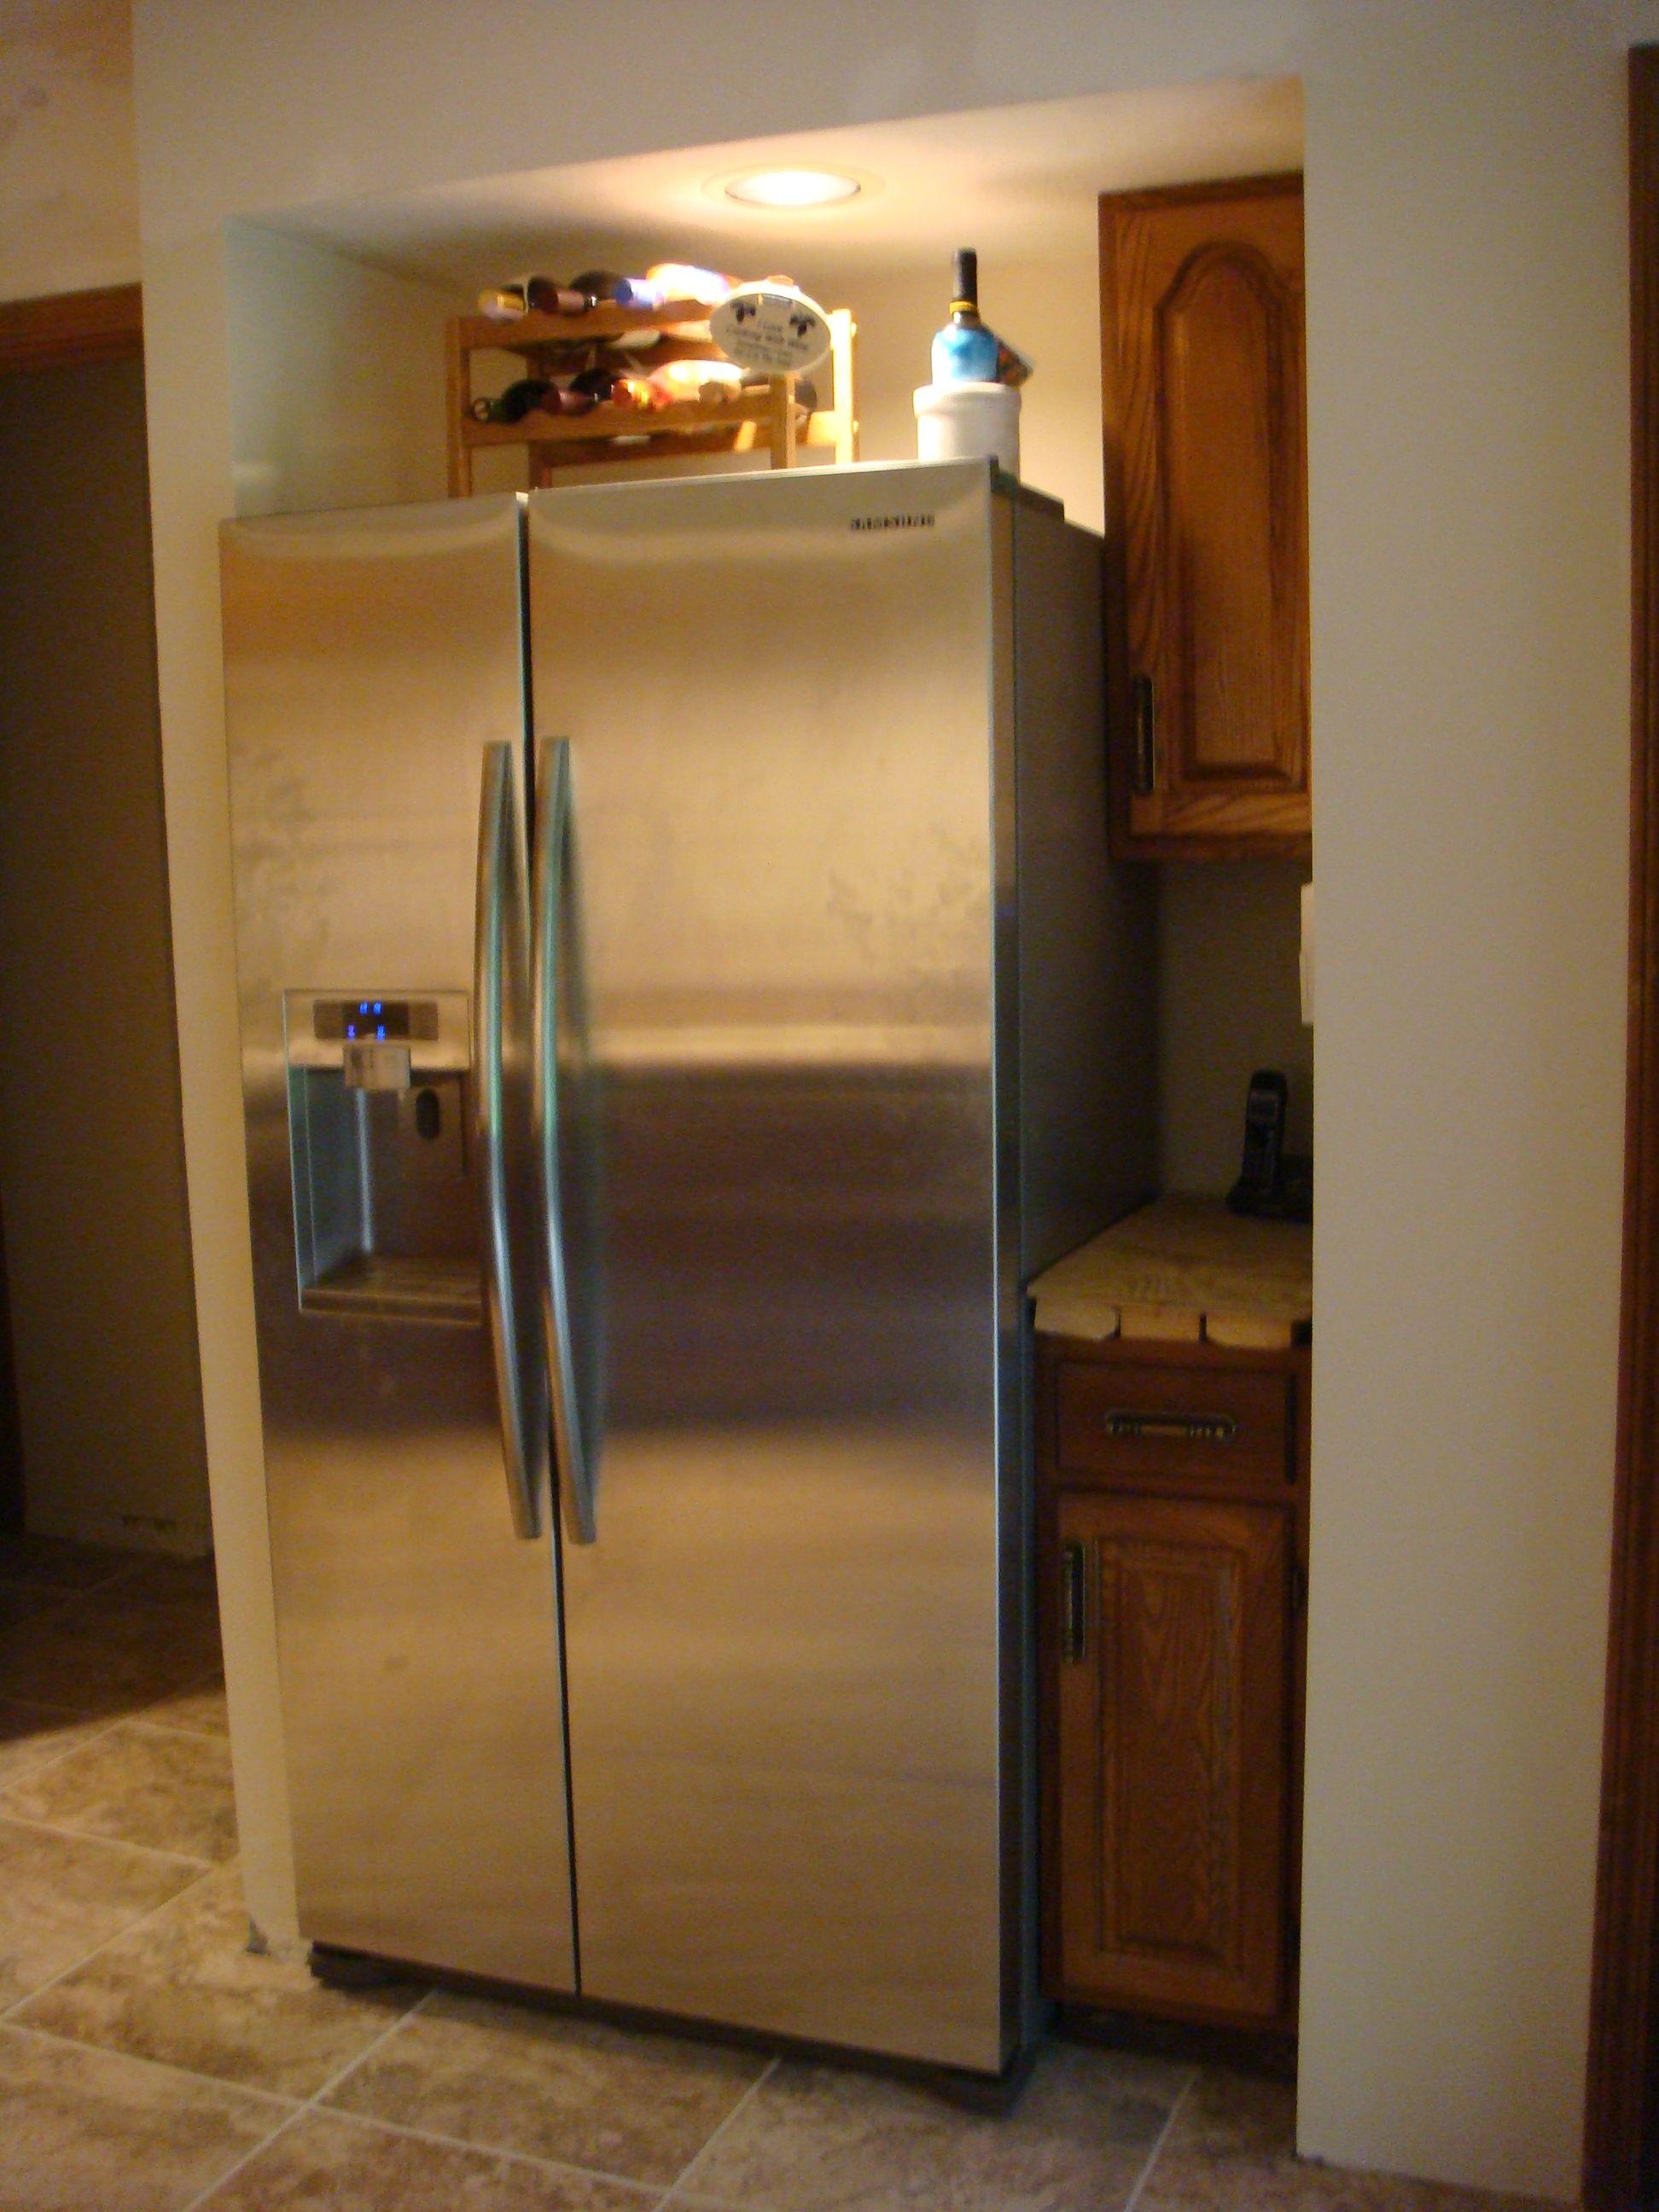 cabinets relocated around refrigerator kitchen remodel